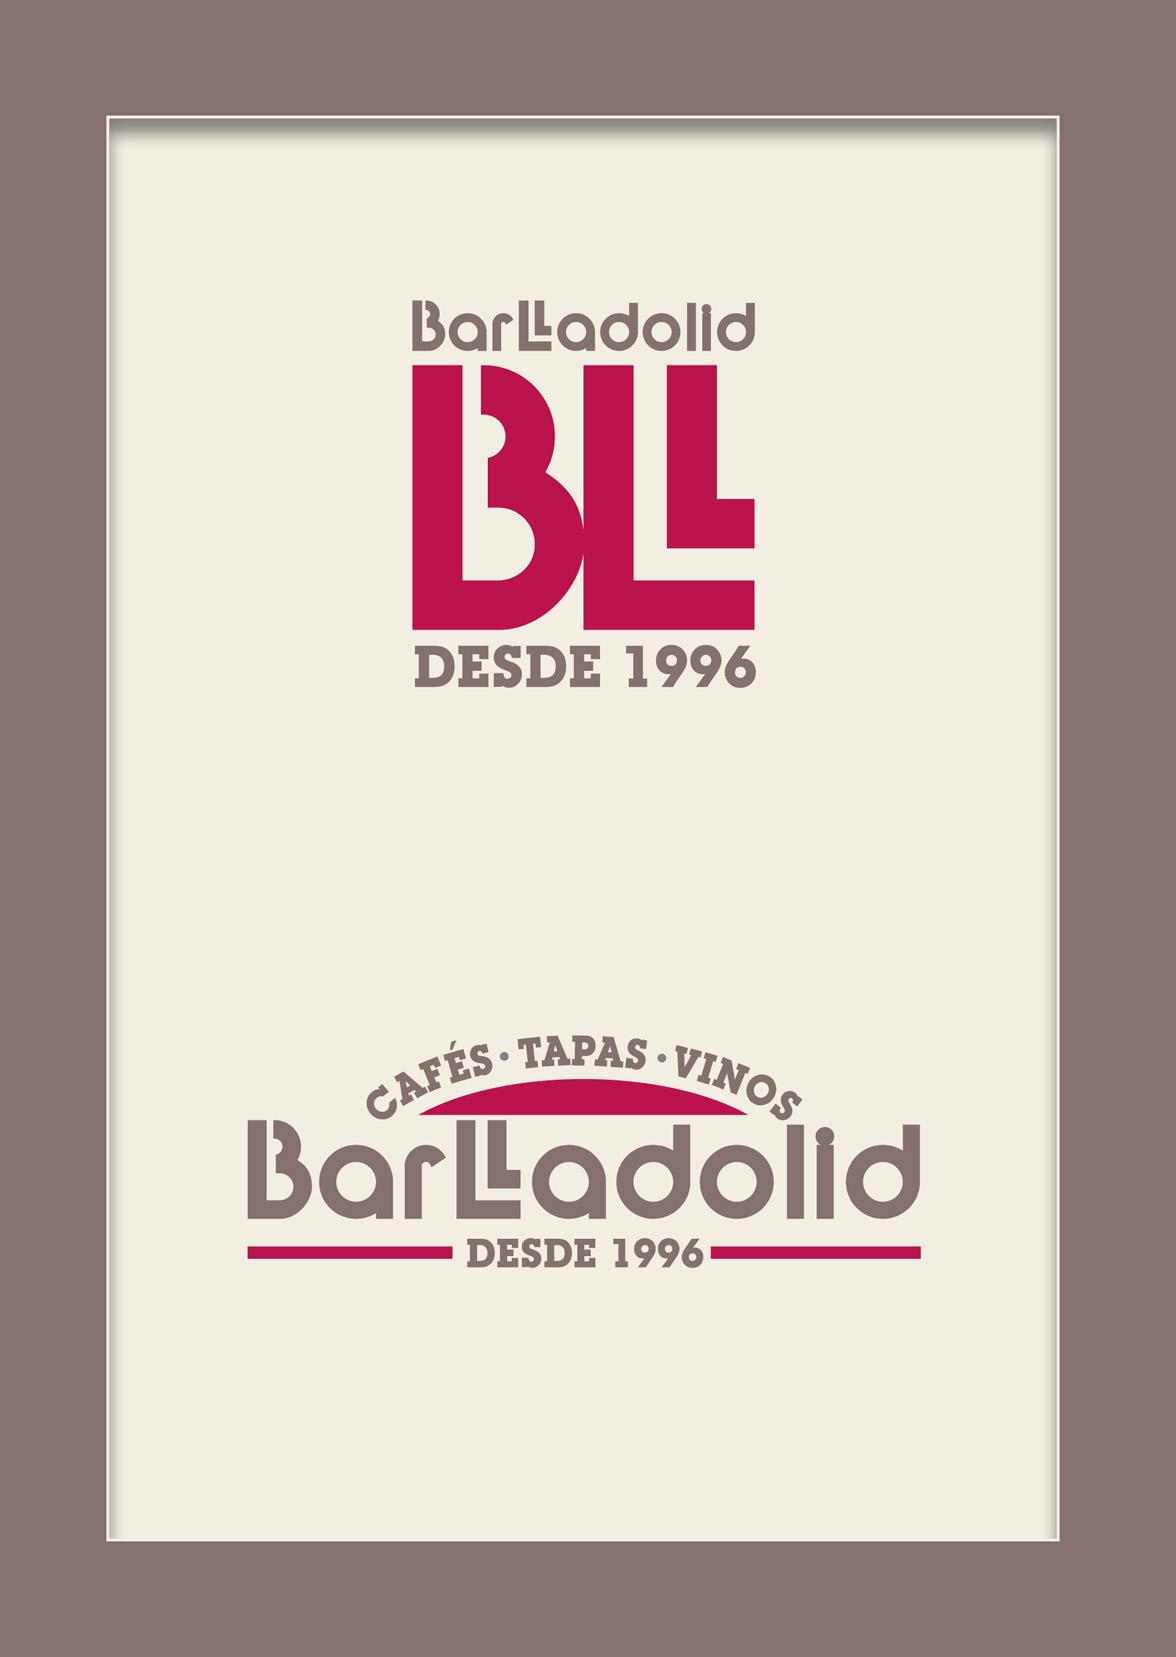 carta-barlladolid